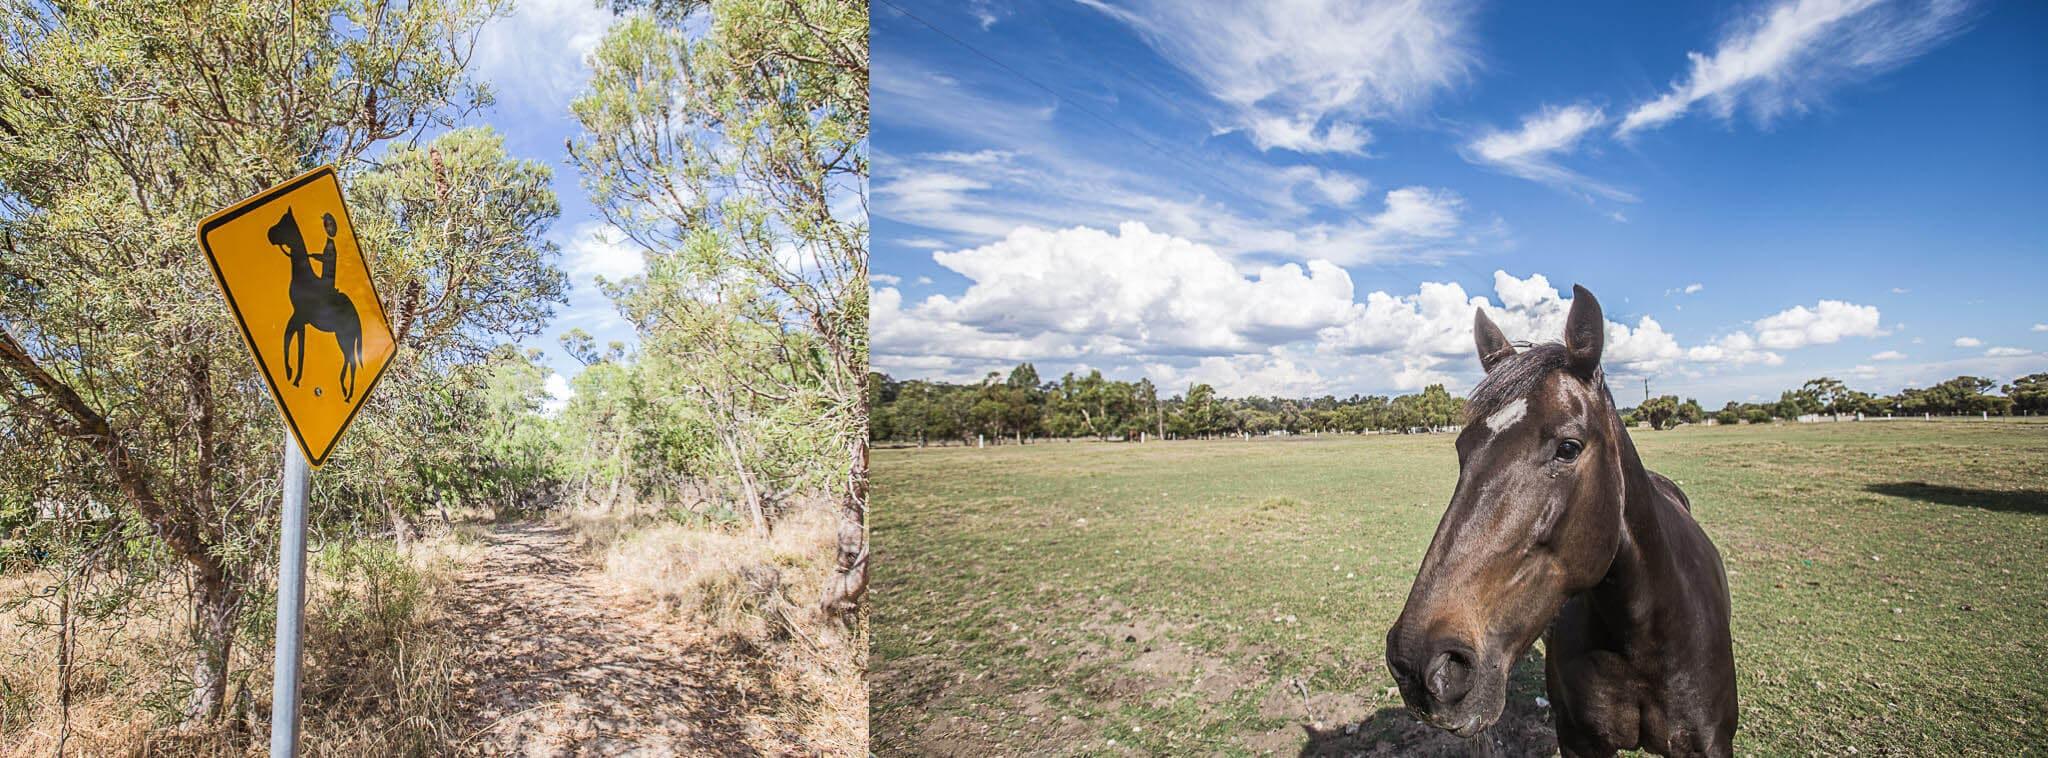 australische-Pferde-Margaret-River-Region